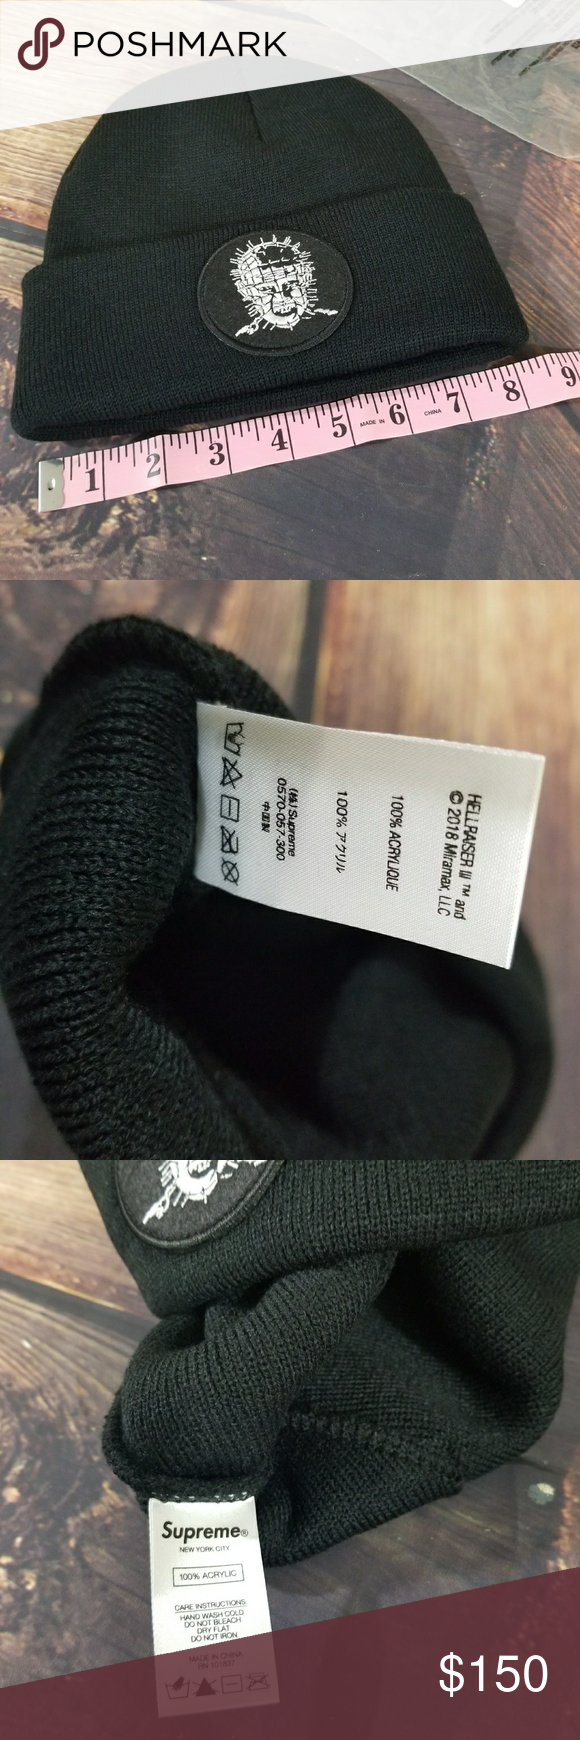 7f6f30998df16 Supreme Hellraiser Beanie NEW IN BAG One Size Hellraiser Pinhead Black  Beanie SS18 by Supreme